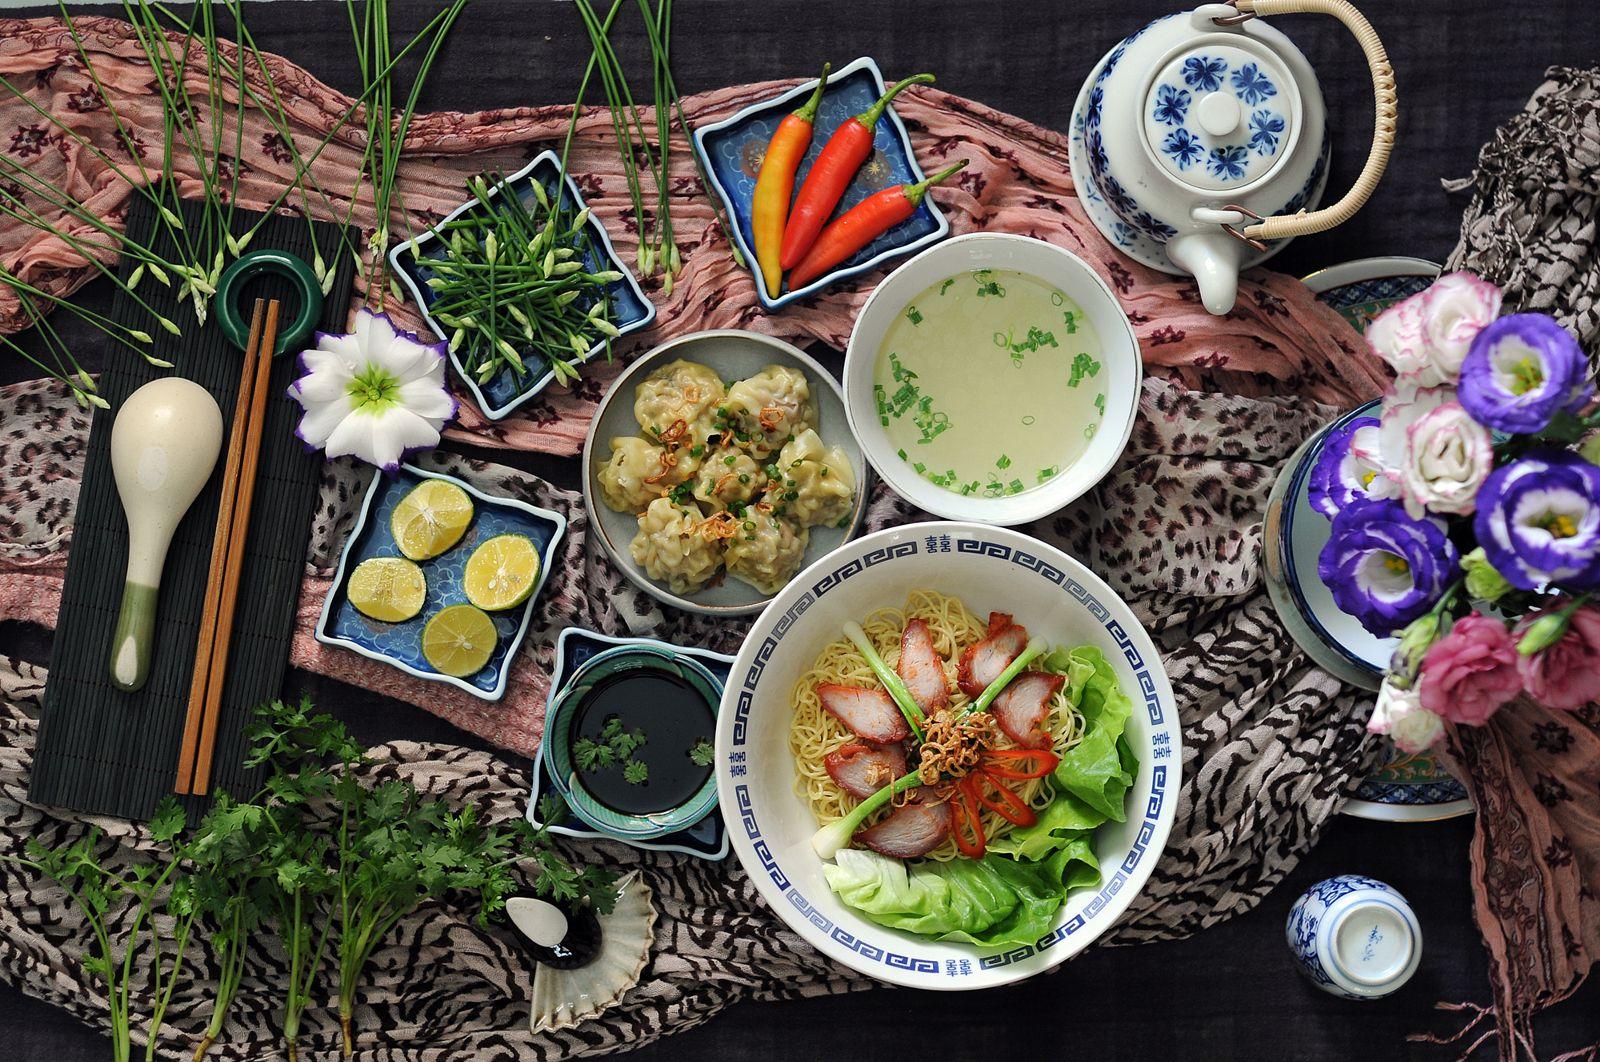 Bun Bo Hue Vietnamese Spicy Noodle Soup Vietnamese Food From Central Vietnam Noodle Soup With Beef And Pork Asian Cooking Asian Recipes Asian Cuisine